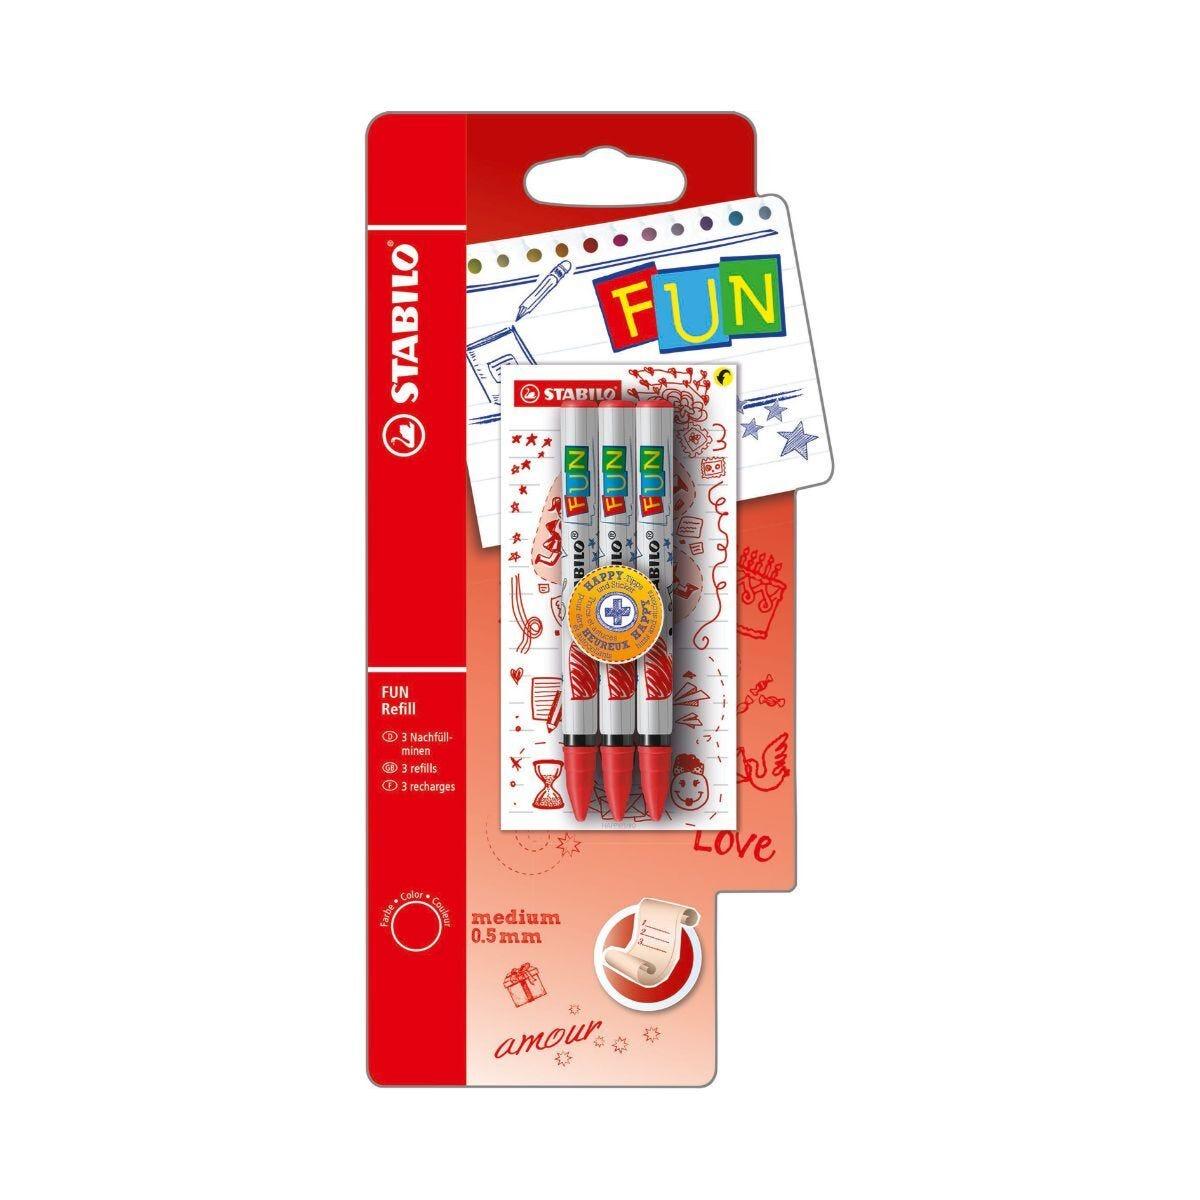 STABILO Fun Refill 3 Pack Plus 2 Concept Stickers Lilac